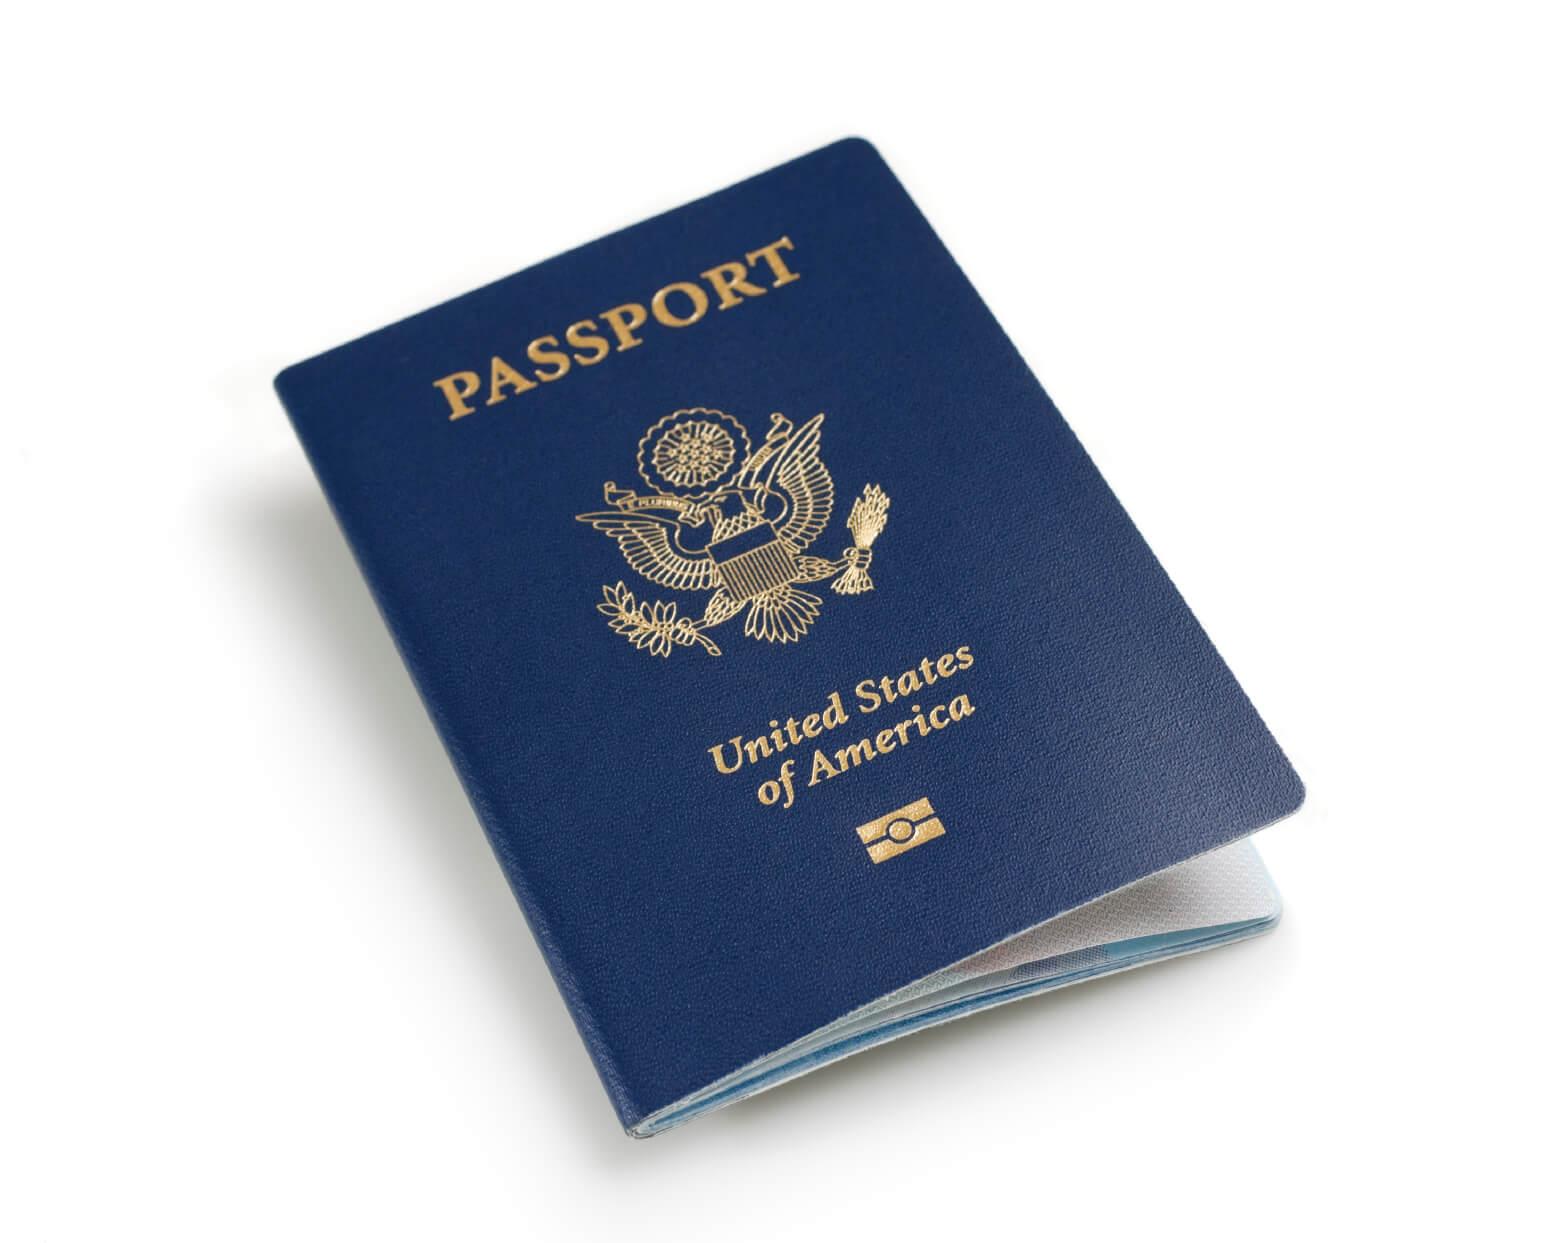 Image: a passport